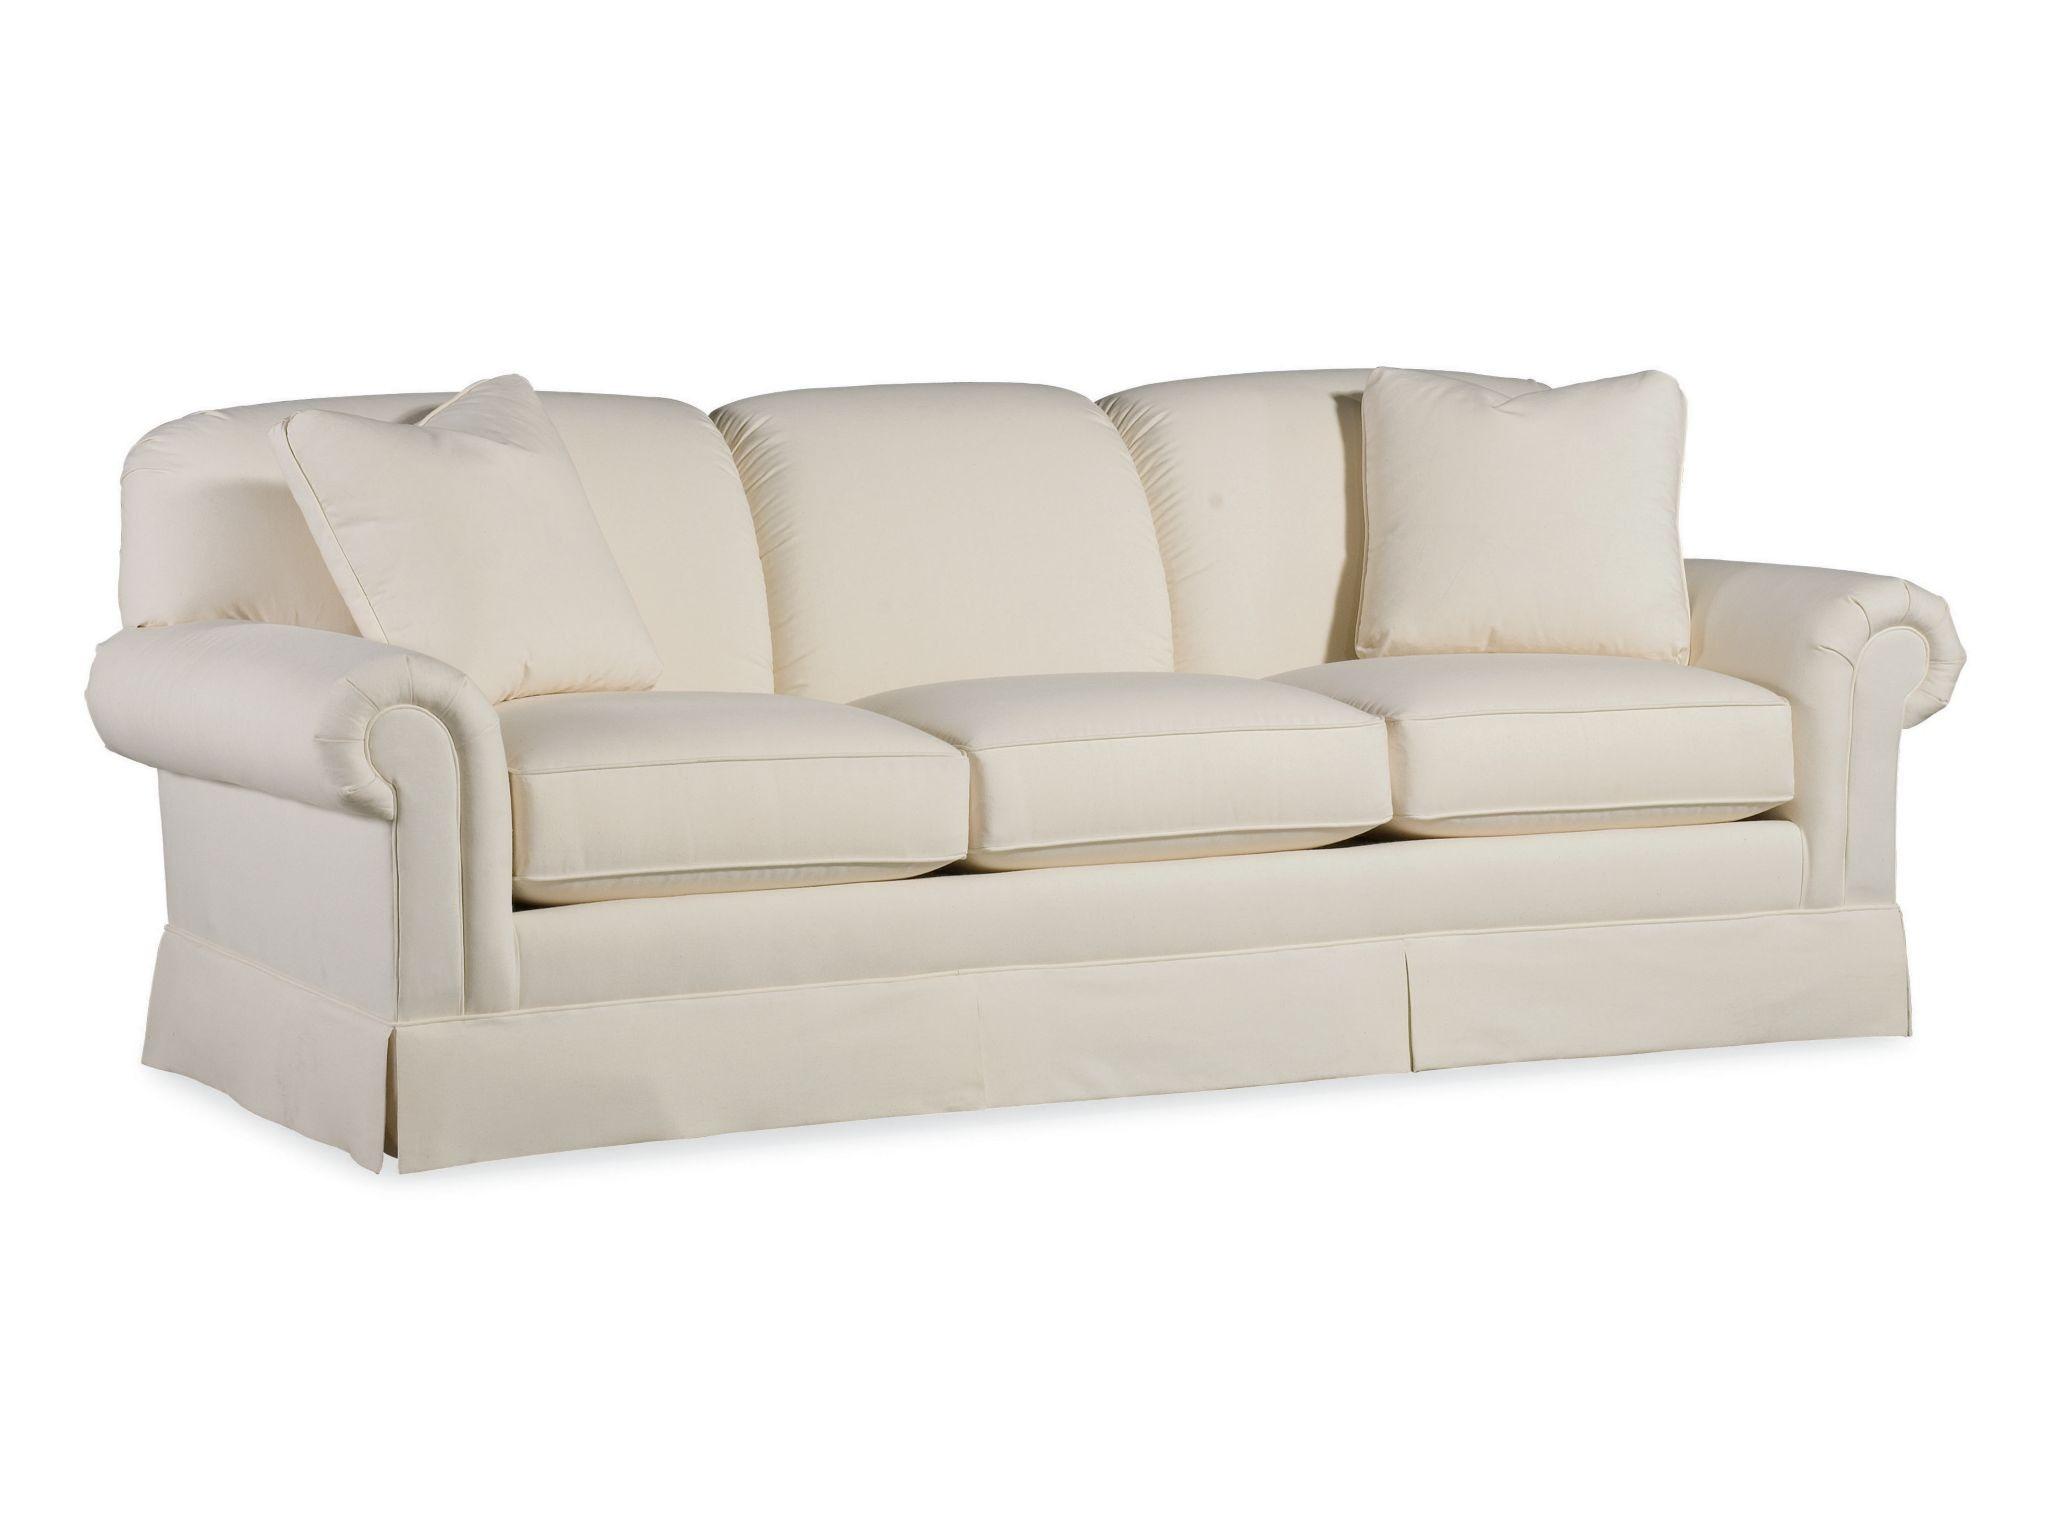 Gentil Thomasville Lancaster Sleeper Sofa 6026 180SL